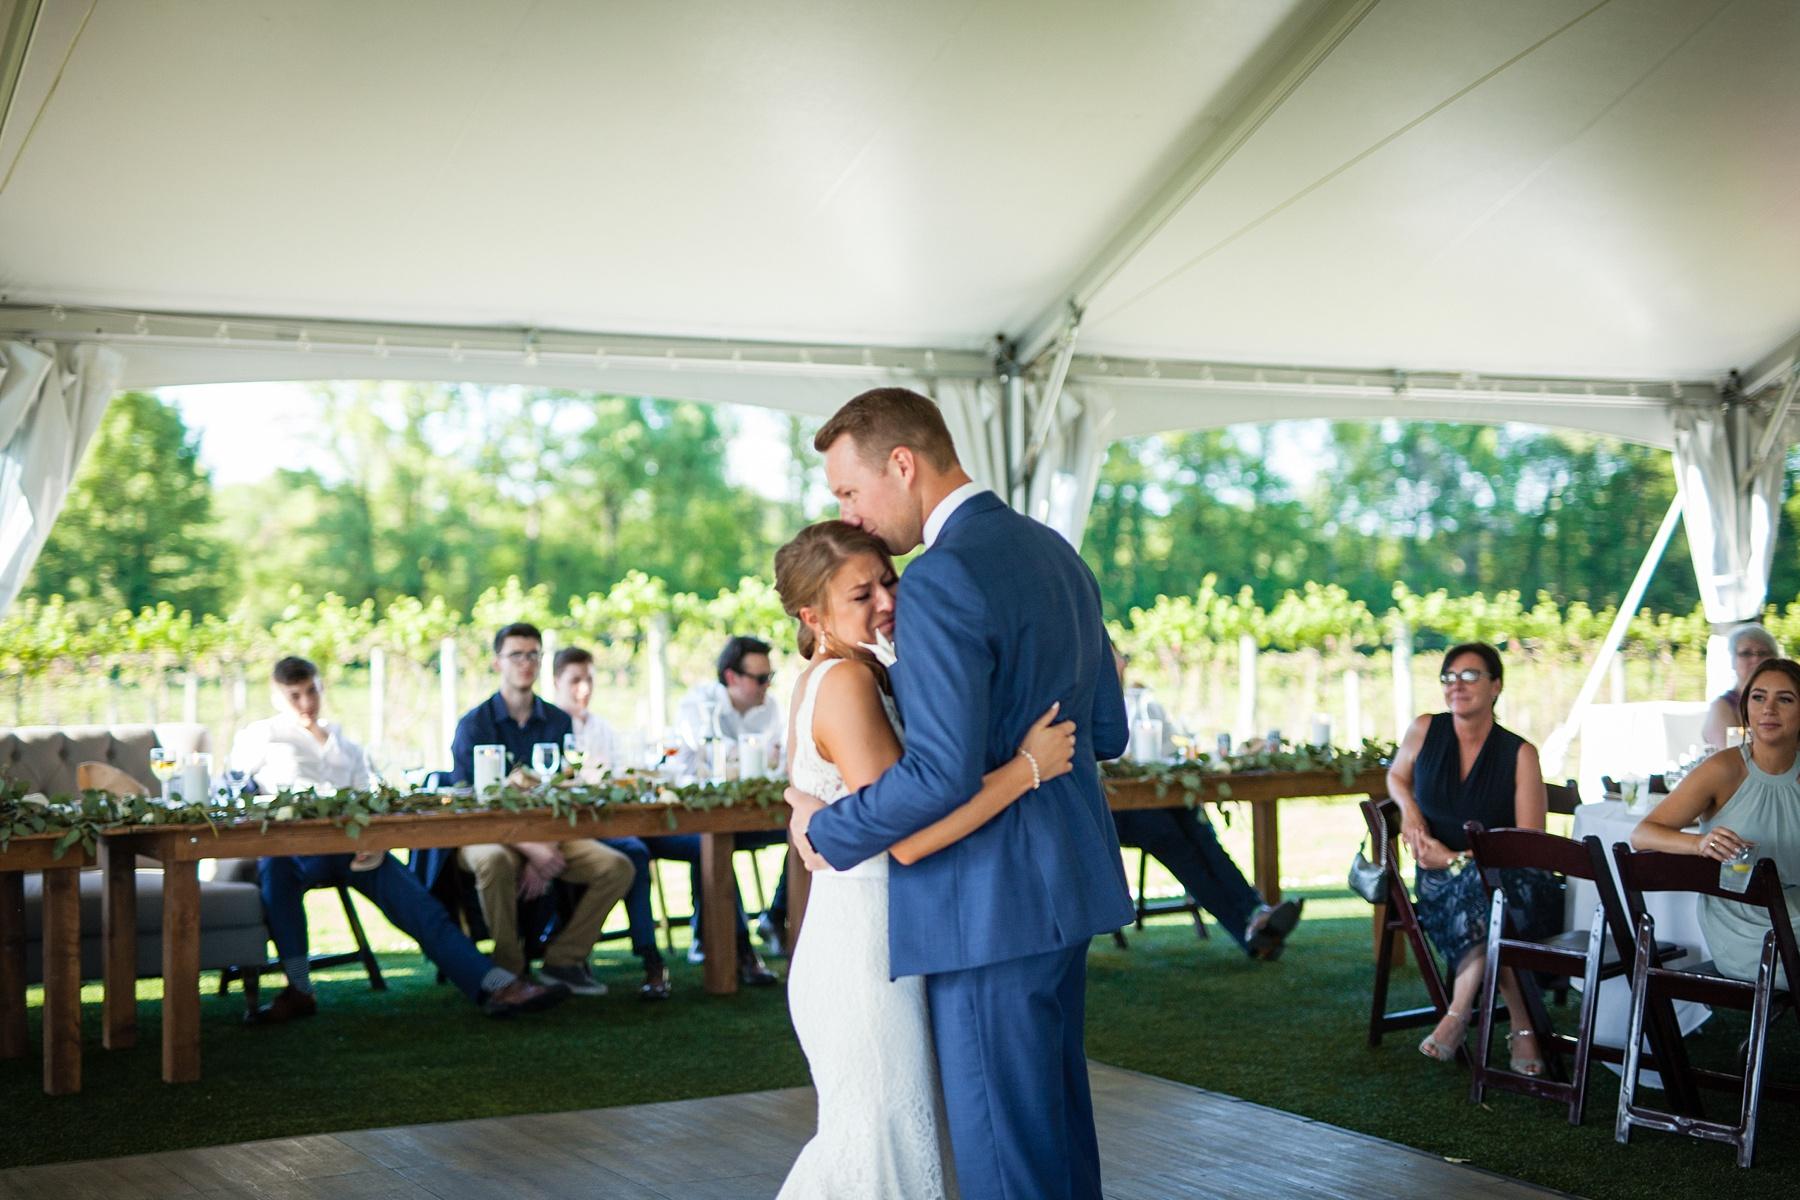 Brandon_Shafer_Photography_Kara_Doug_12_corners_Wedding_Benton_Harbor_0064.jpg